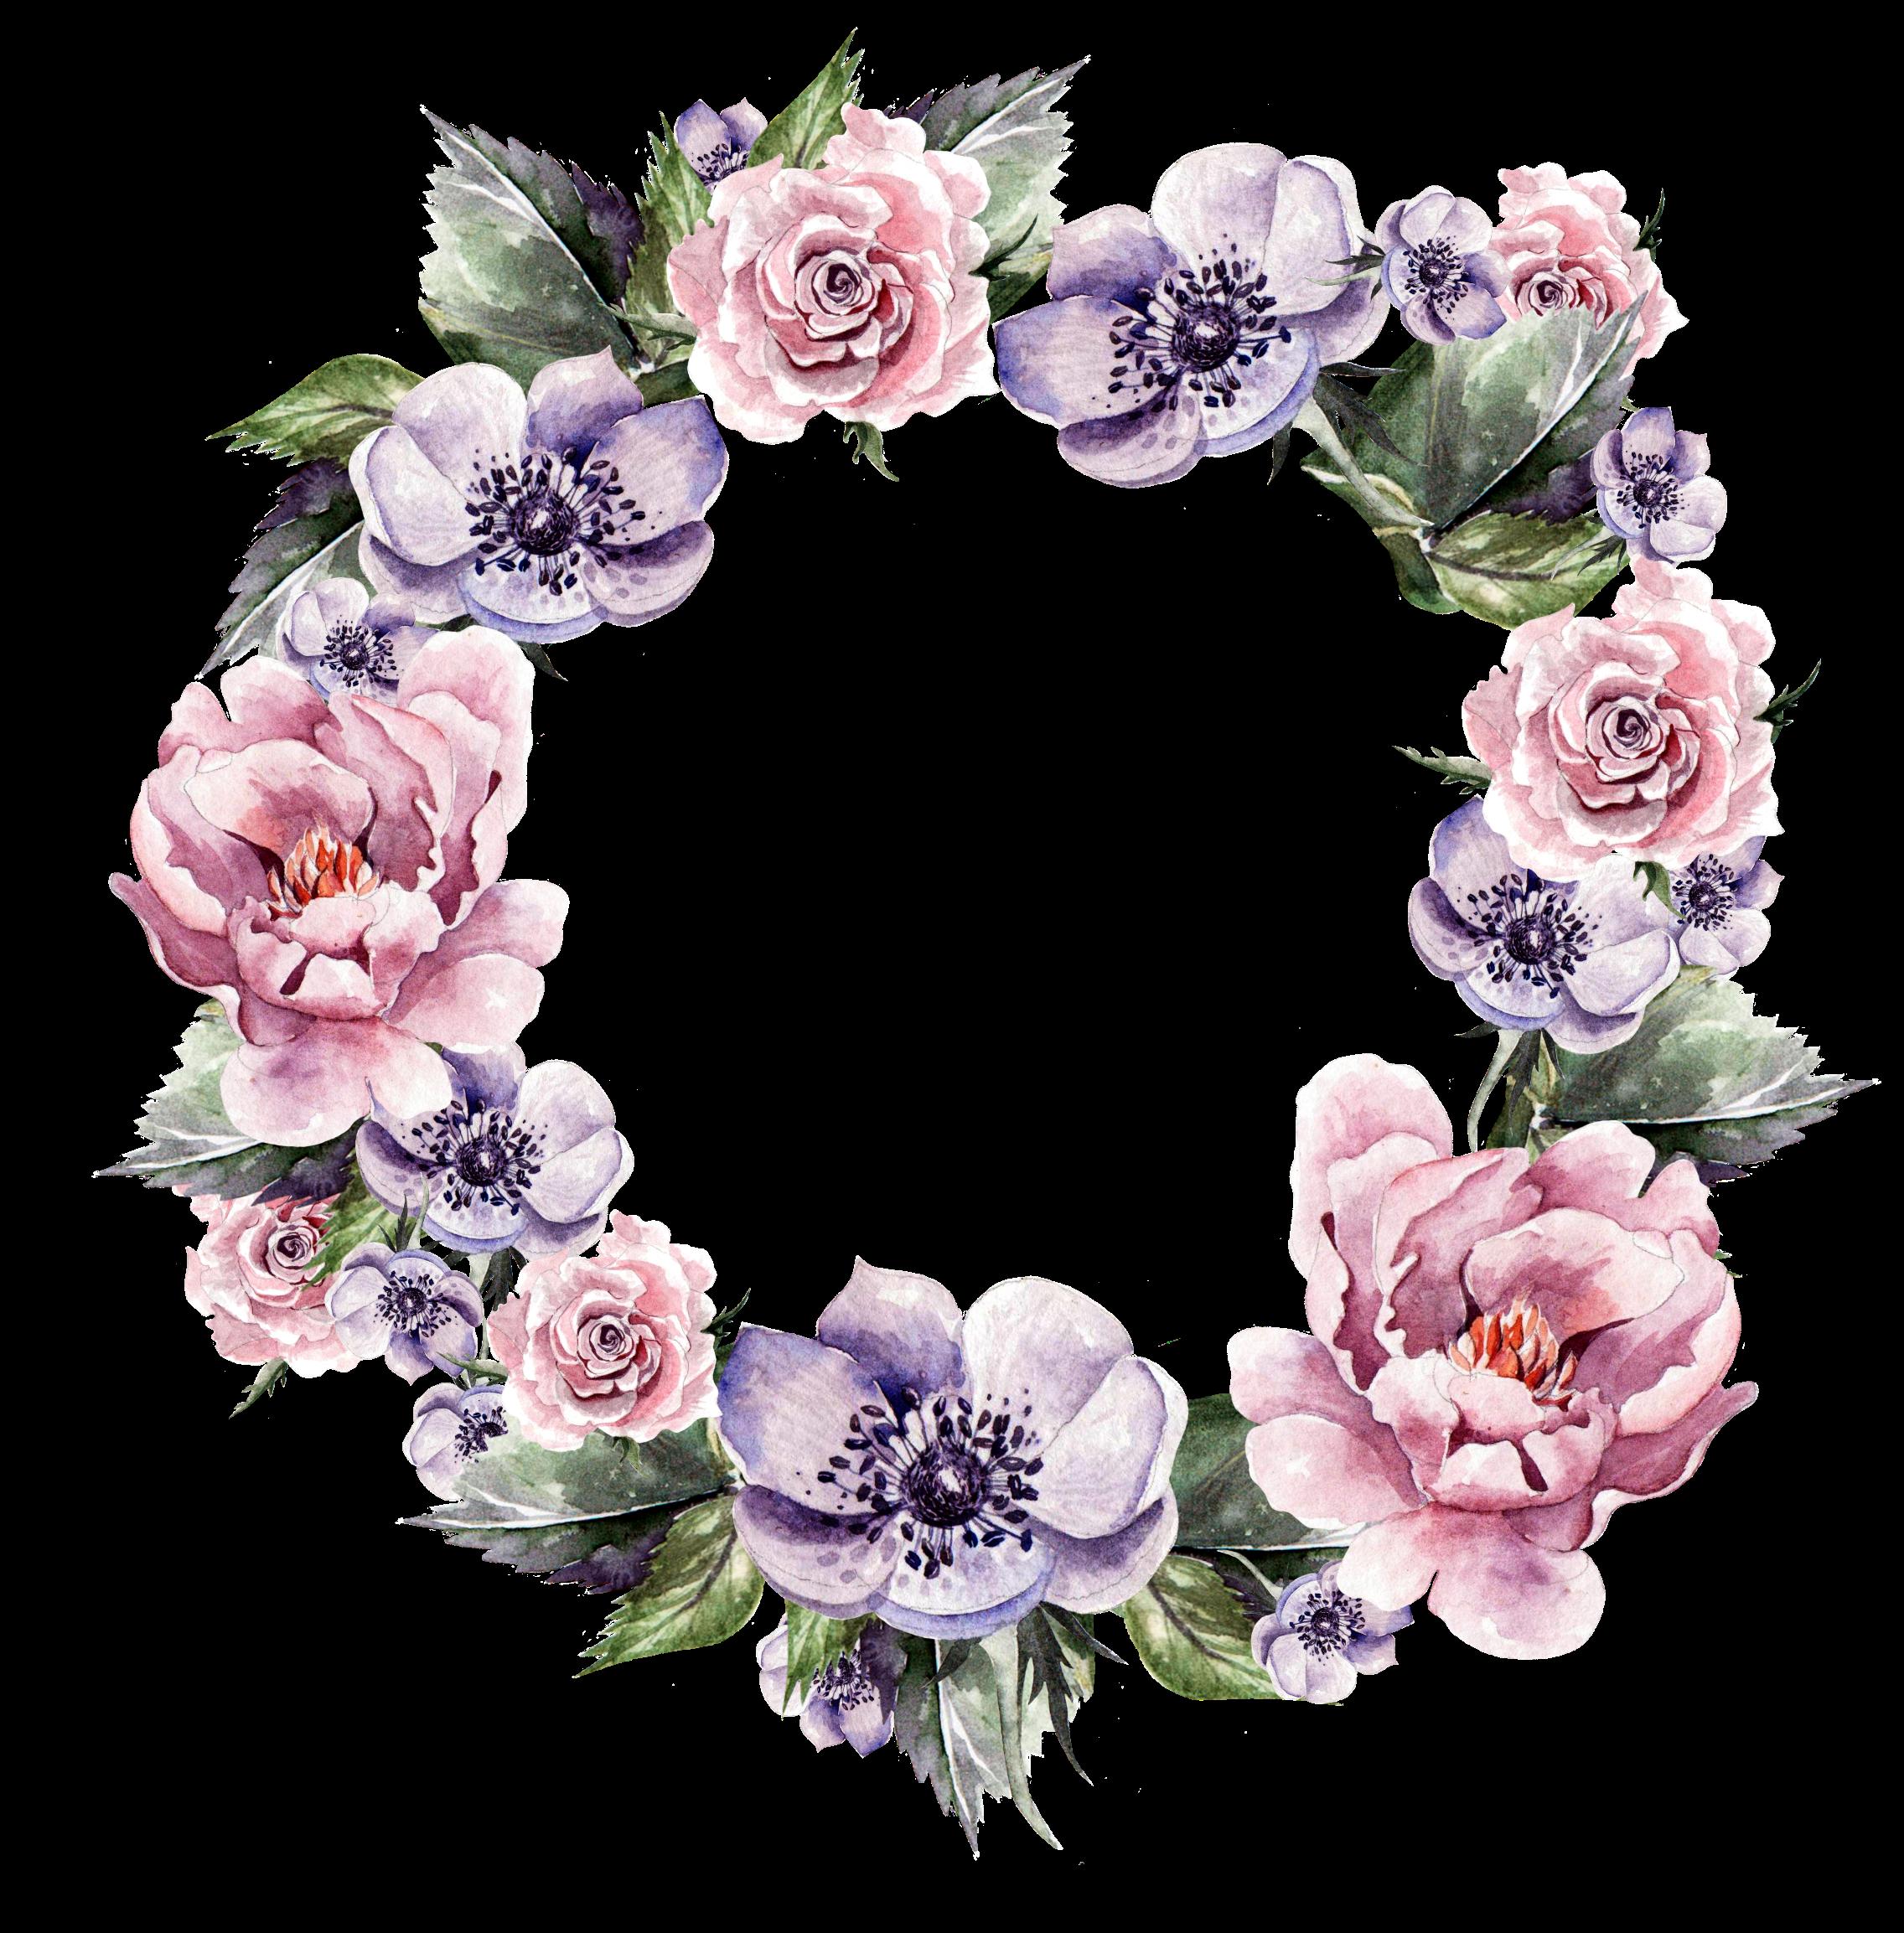 Pin By Modorova Svetlana On Venochki Watercolor Flower Wreath Wreath Watercolor Flower Painting